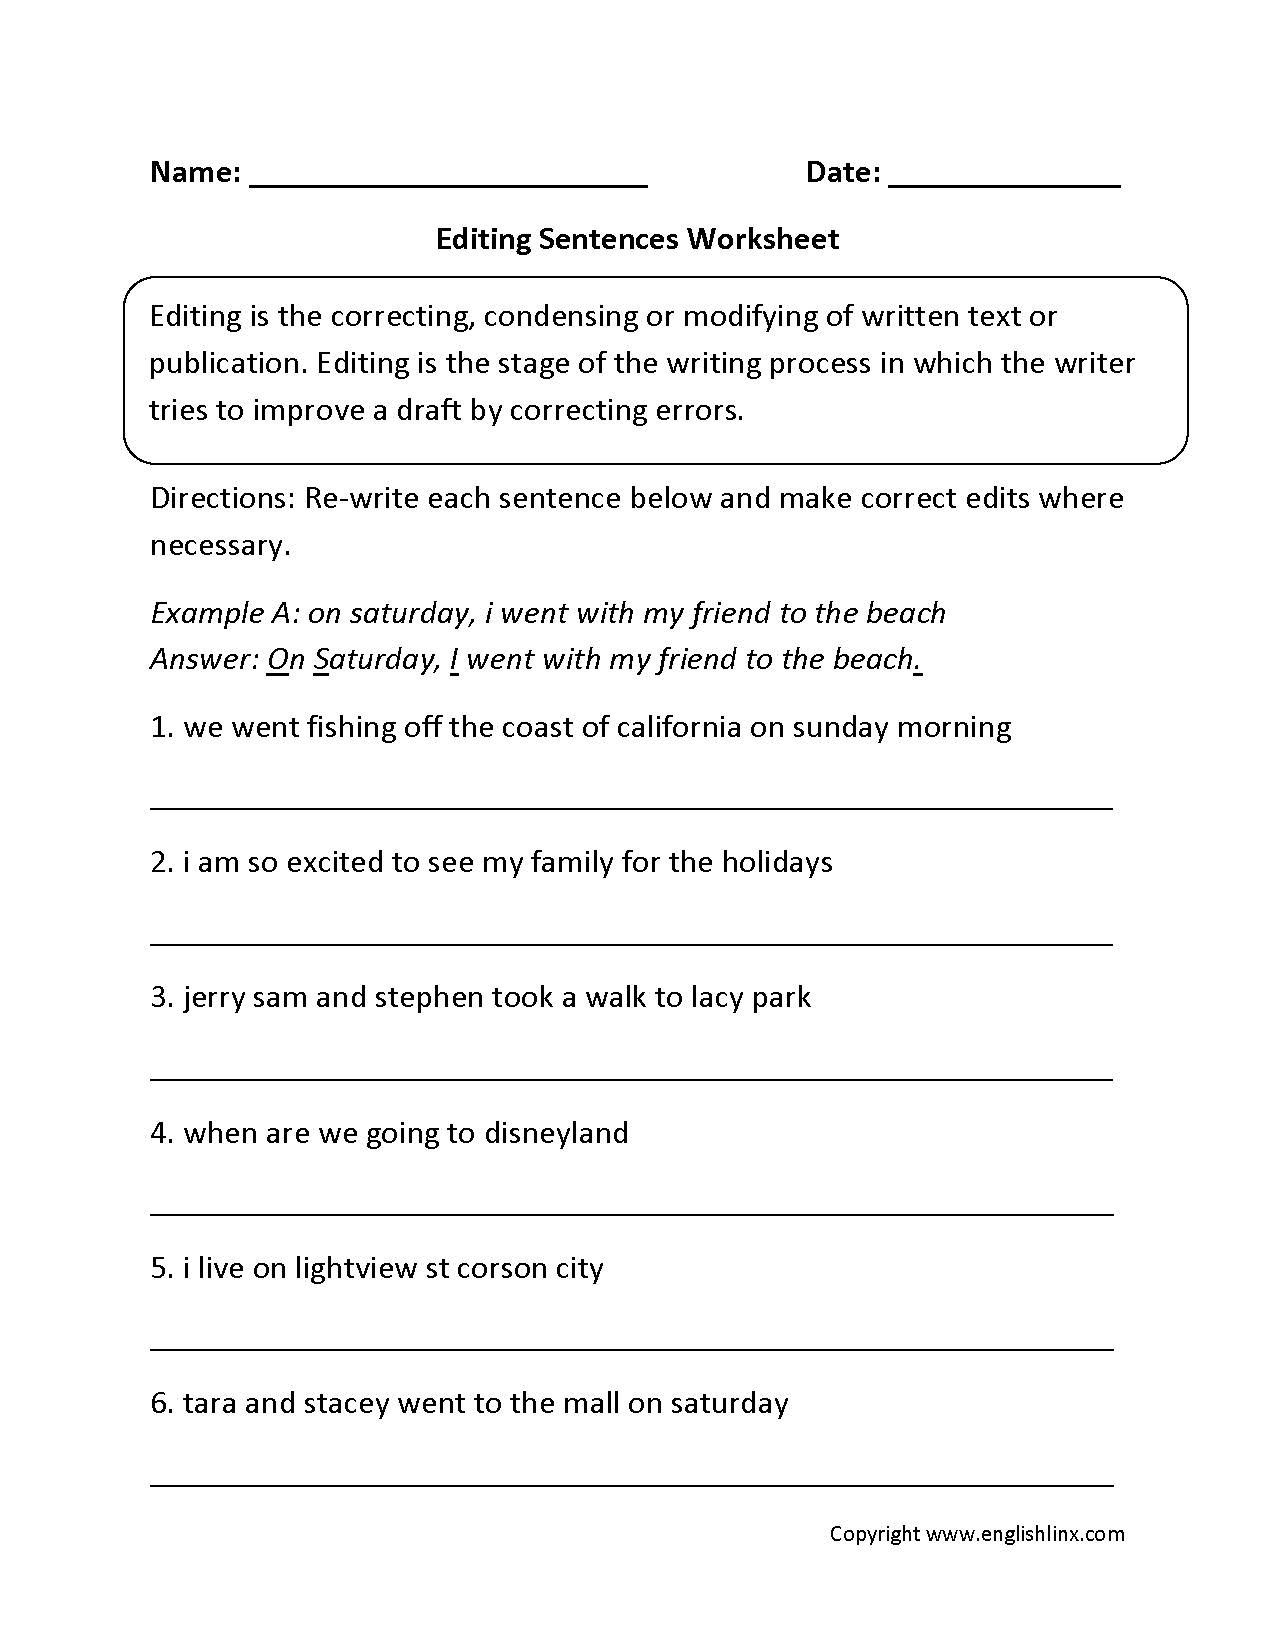 Writing Worksheets | Editing Worksheets - Free Printable Sentence | Free Printable Sentence Correction Worksheets